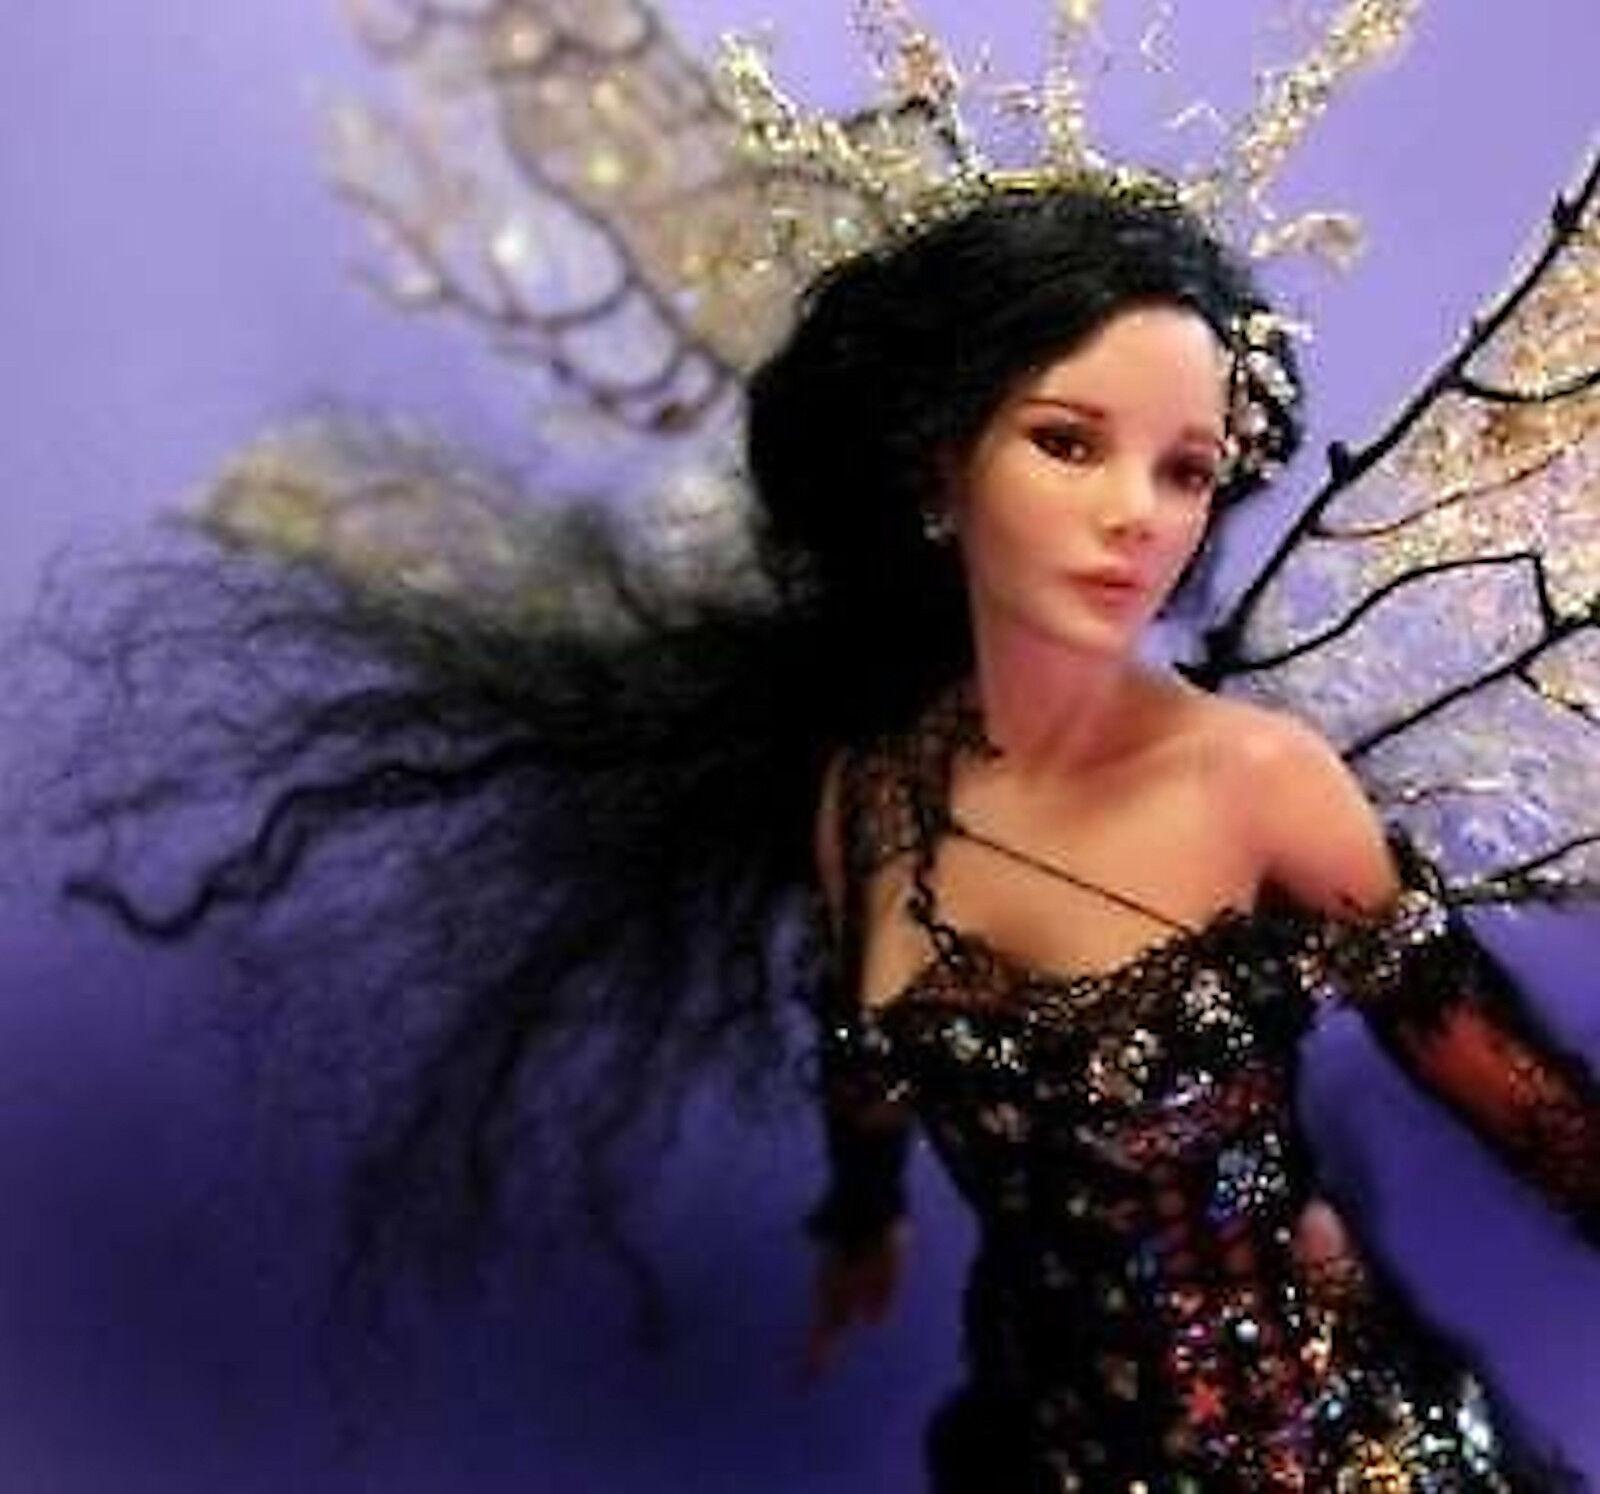 Form Elfe Elfe Elfe Frau Puppe Figur Abformung ooak f. Modelliermasse zB Fimo Einzelstück 0c14a9